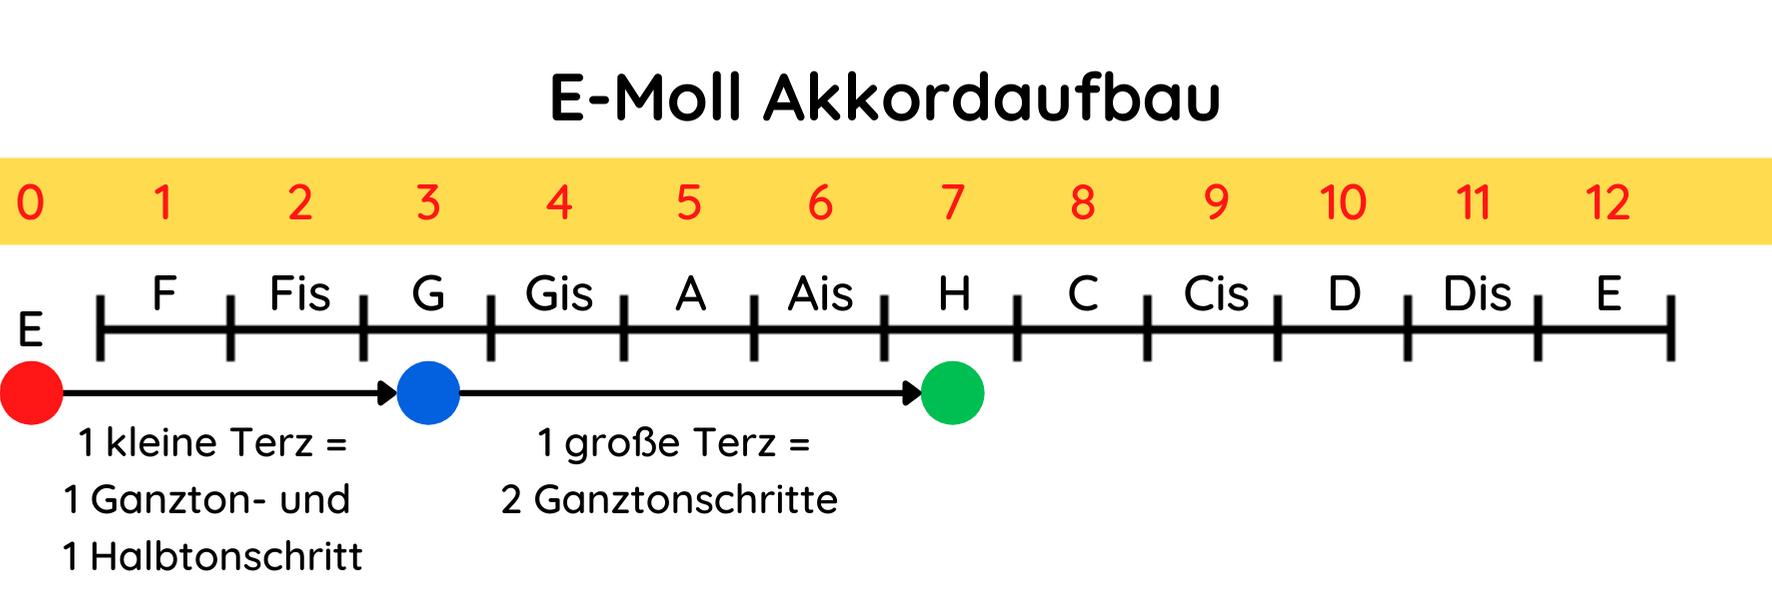 E-Moll Akkordaufbau